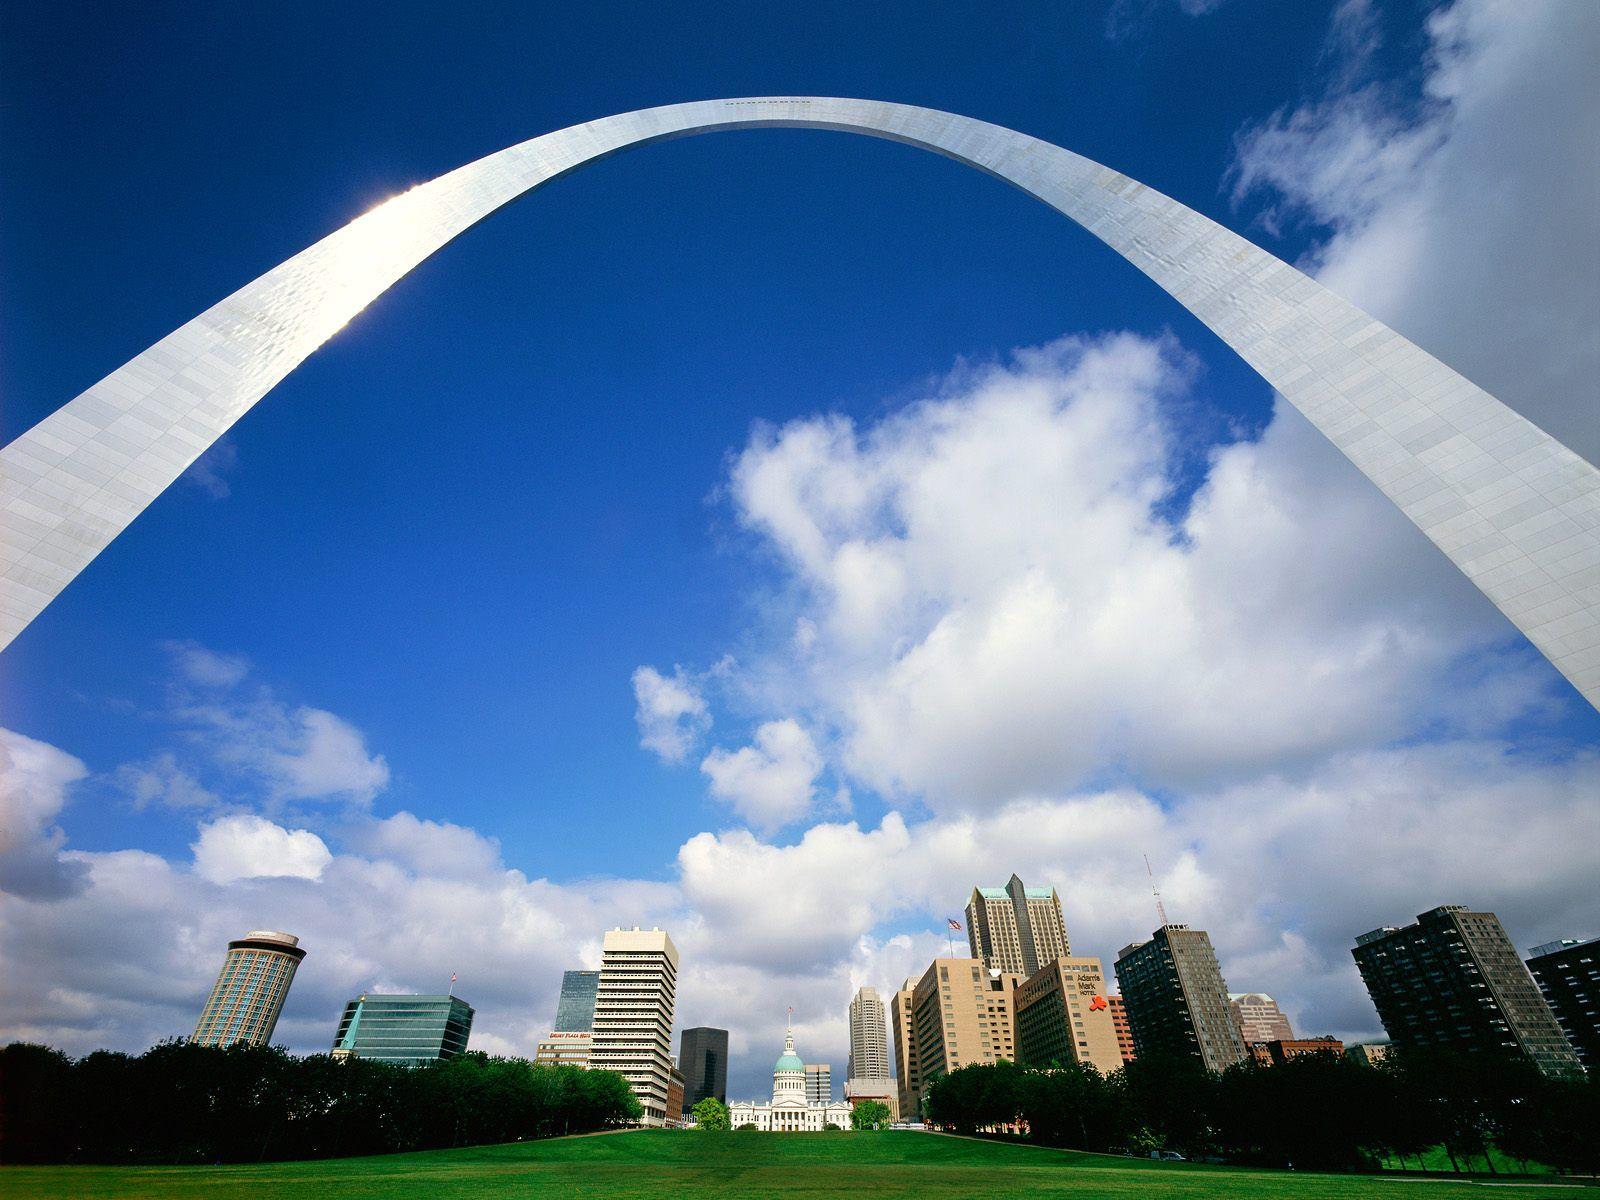 St Louis Missouri postcard Gateway Arch St Louis Missouri wallpaper 1600x1200